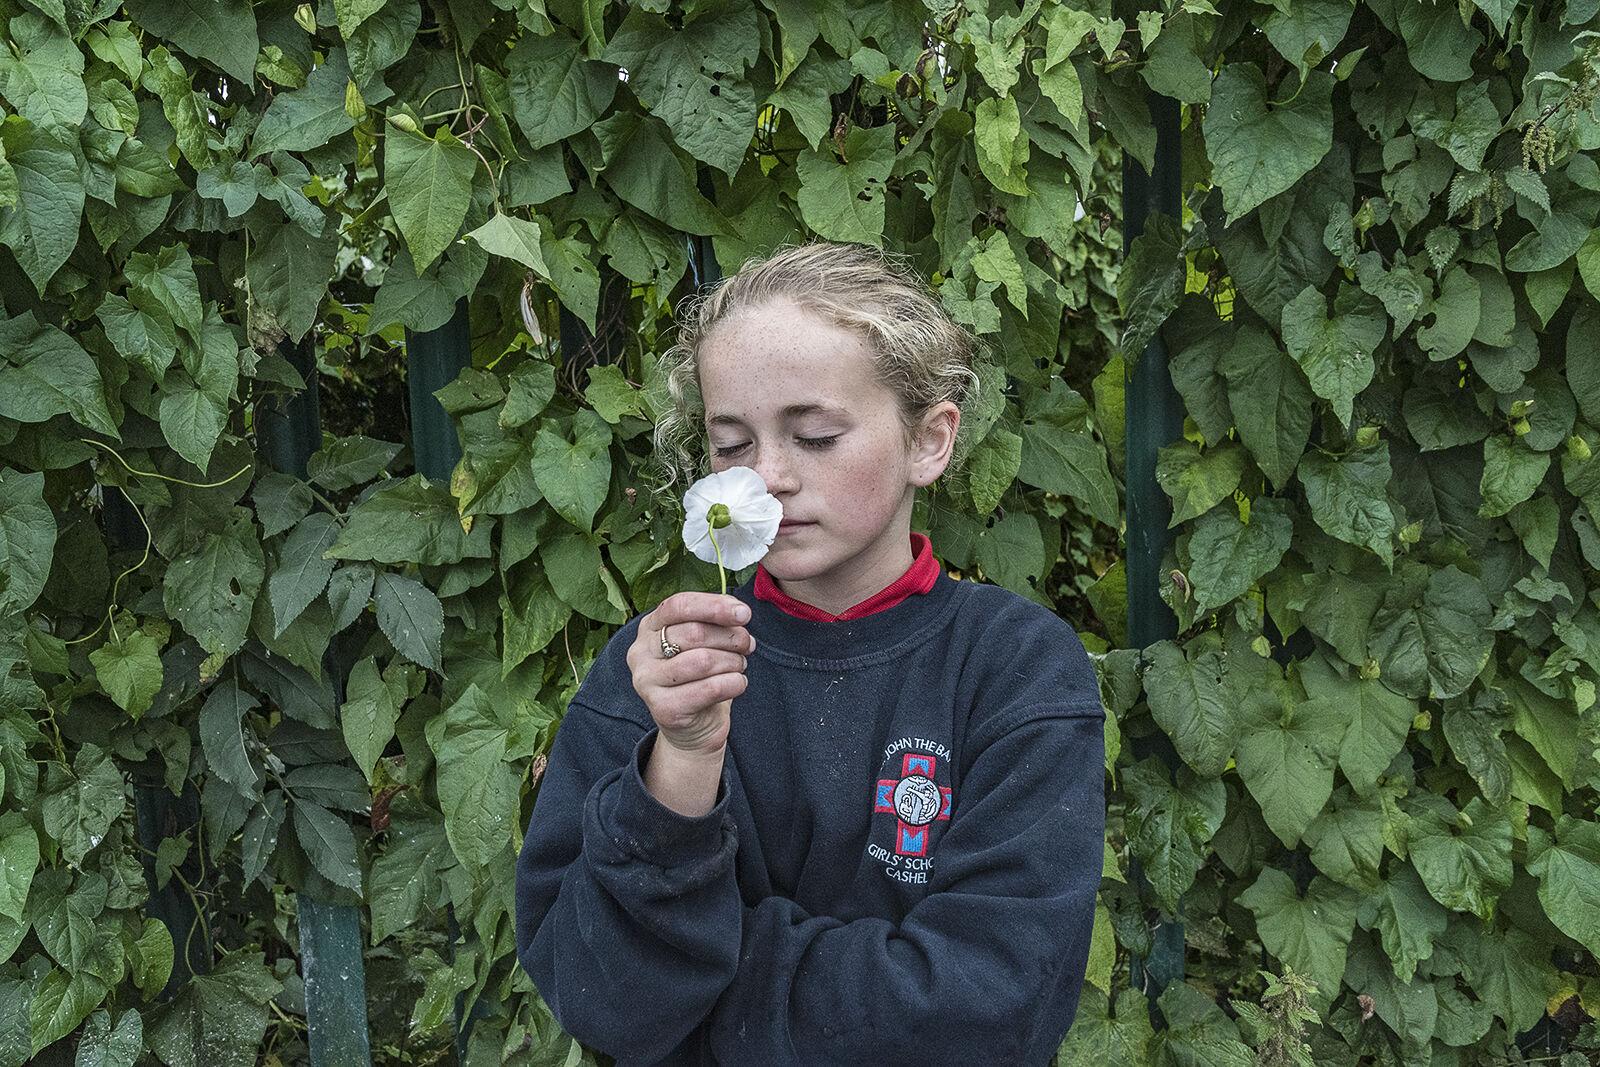 Kaitlyn smelling Flower, Tipperary, Ireland 2019